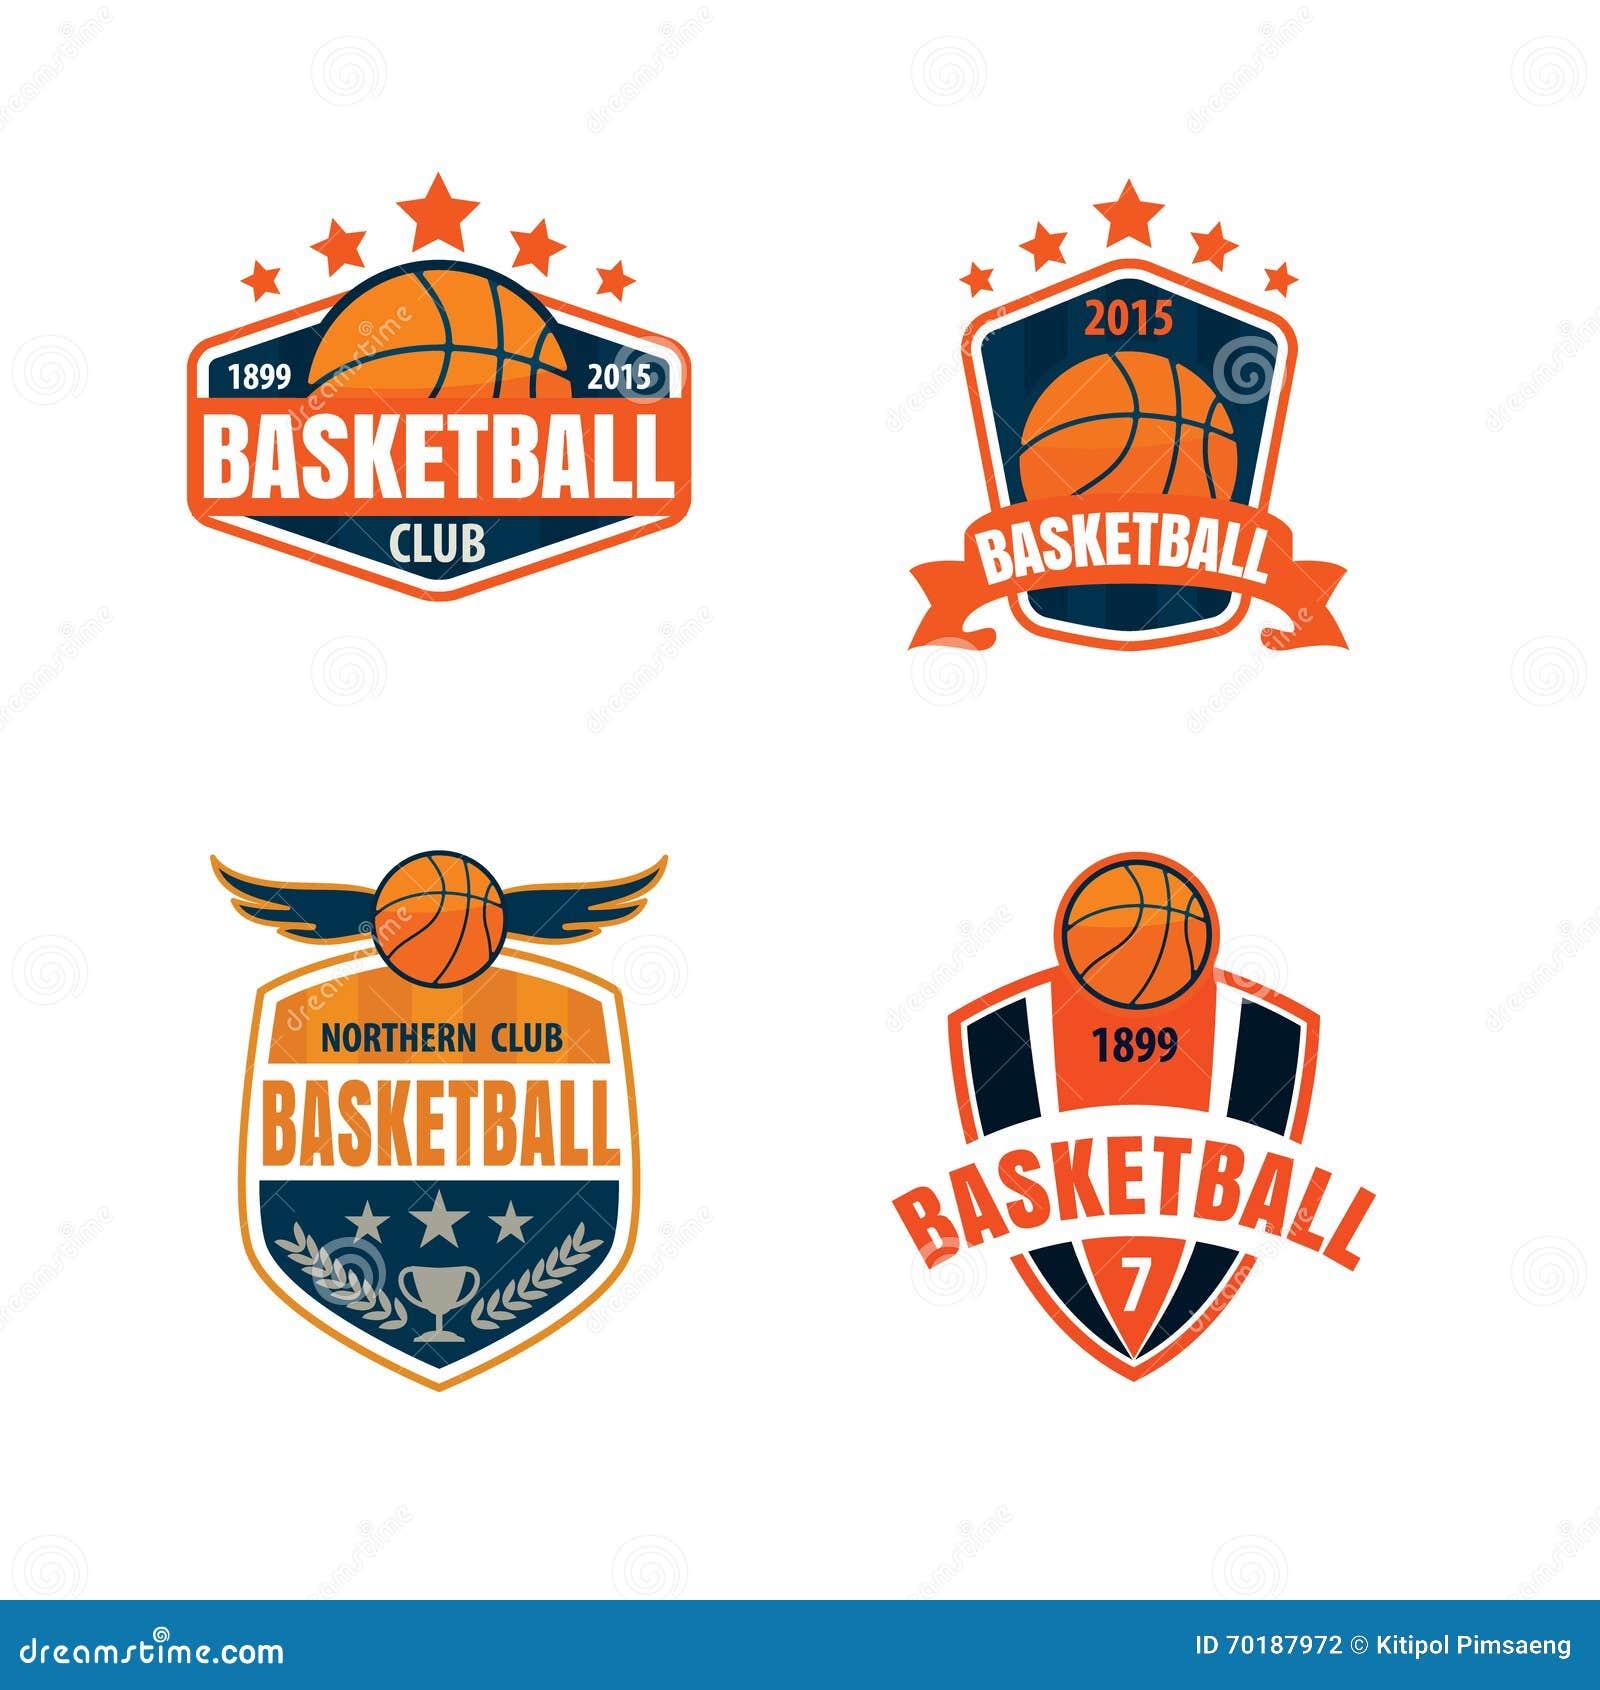 Basketball logo template stock vector. Illustration of ...